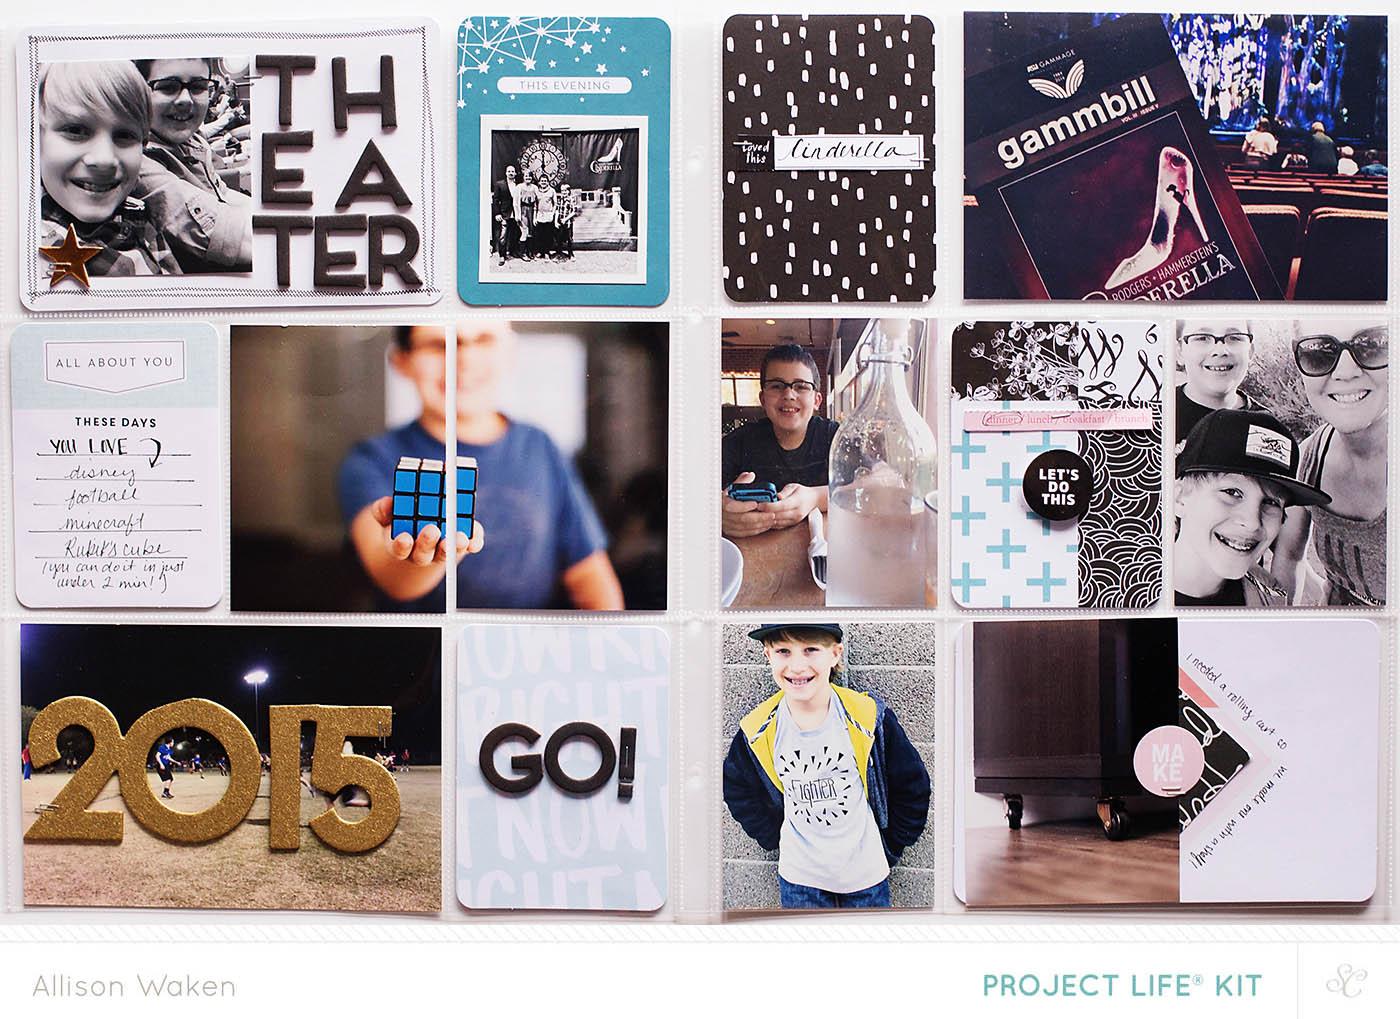 Allison Waken May 2015 Project Life Spread